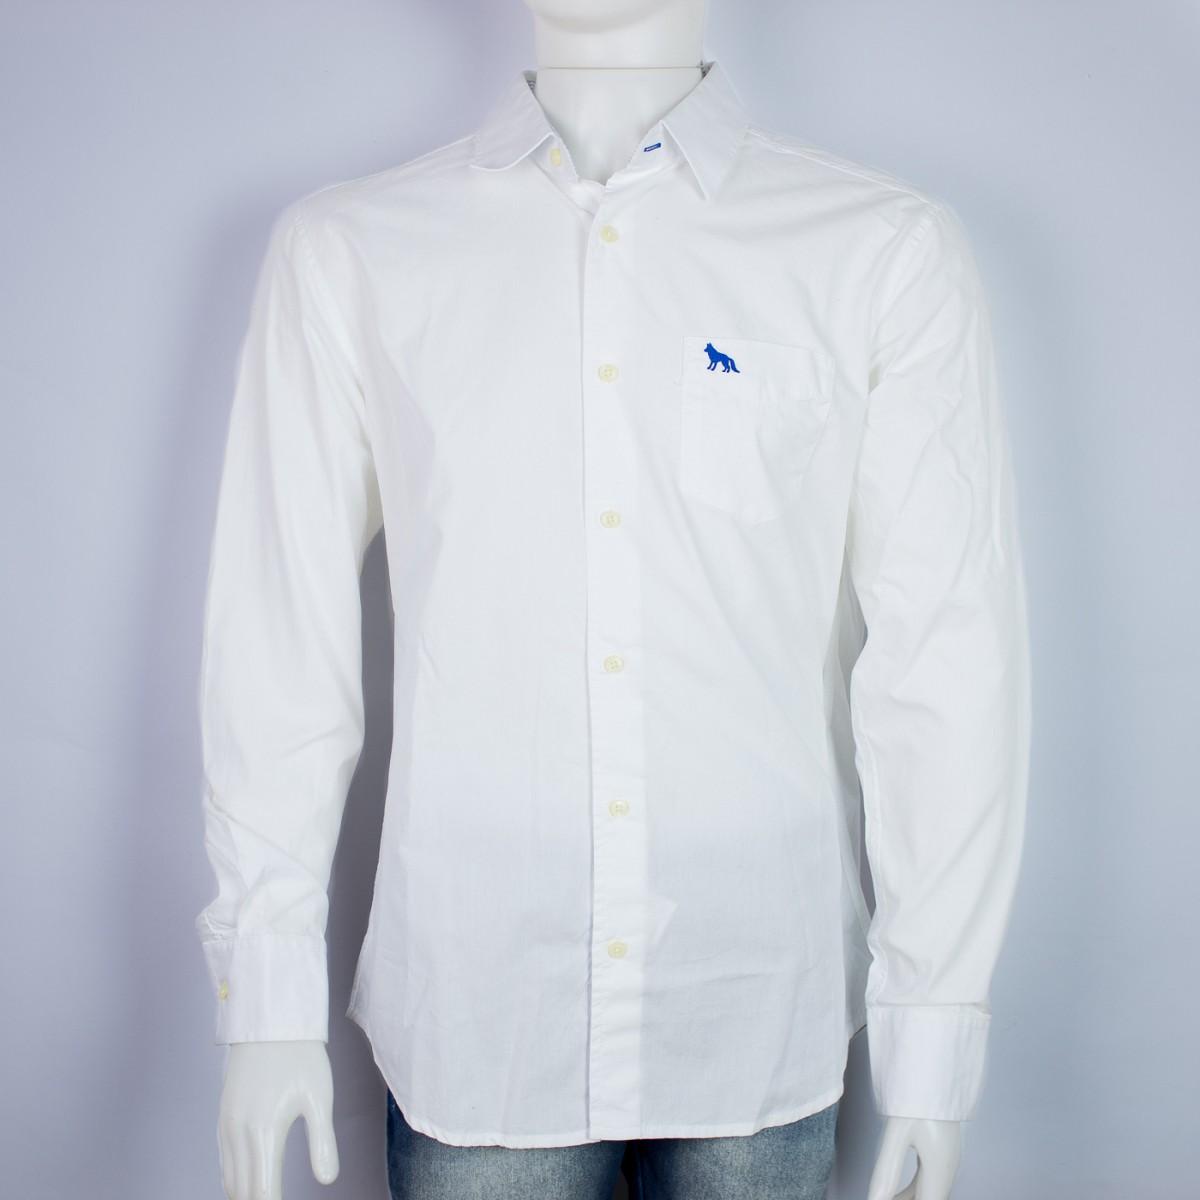 b40e3b6c2 Bizz Store - Camisa Social Masculina Acostamento Branca Lisa